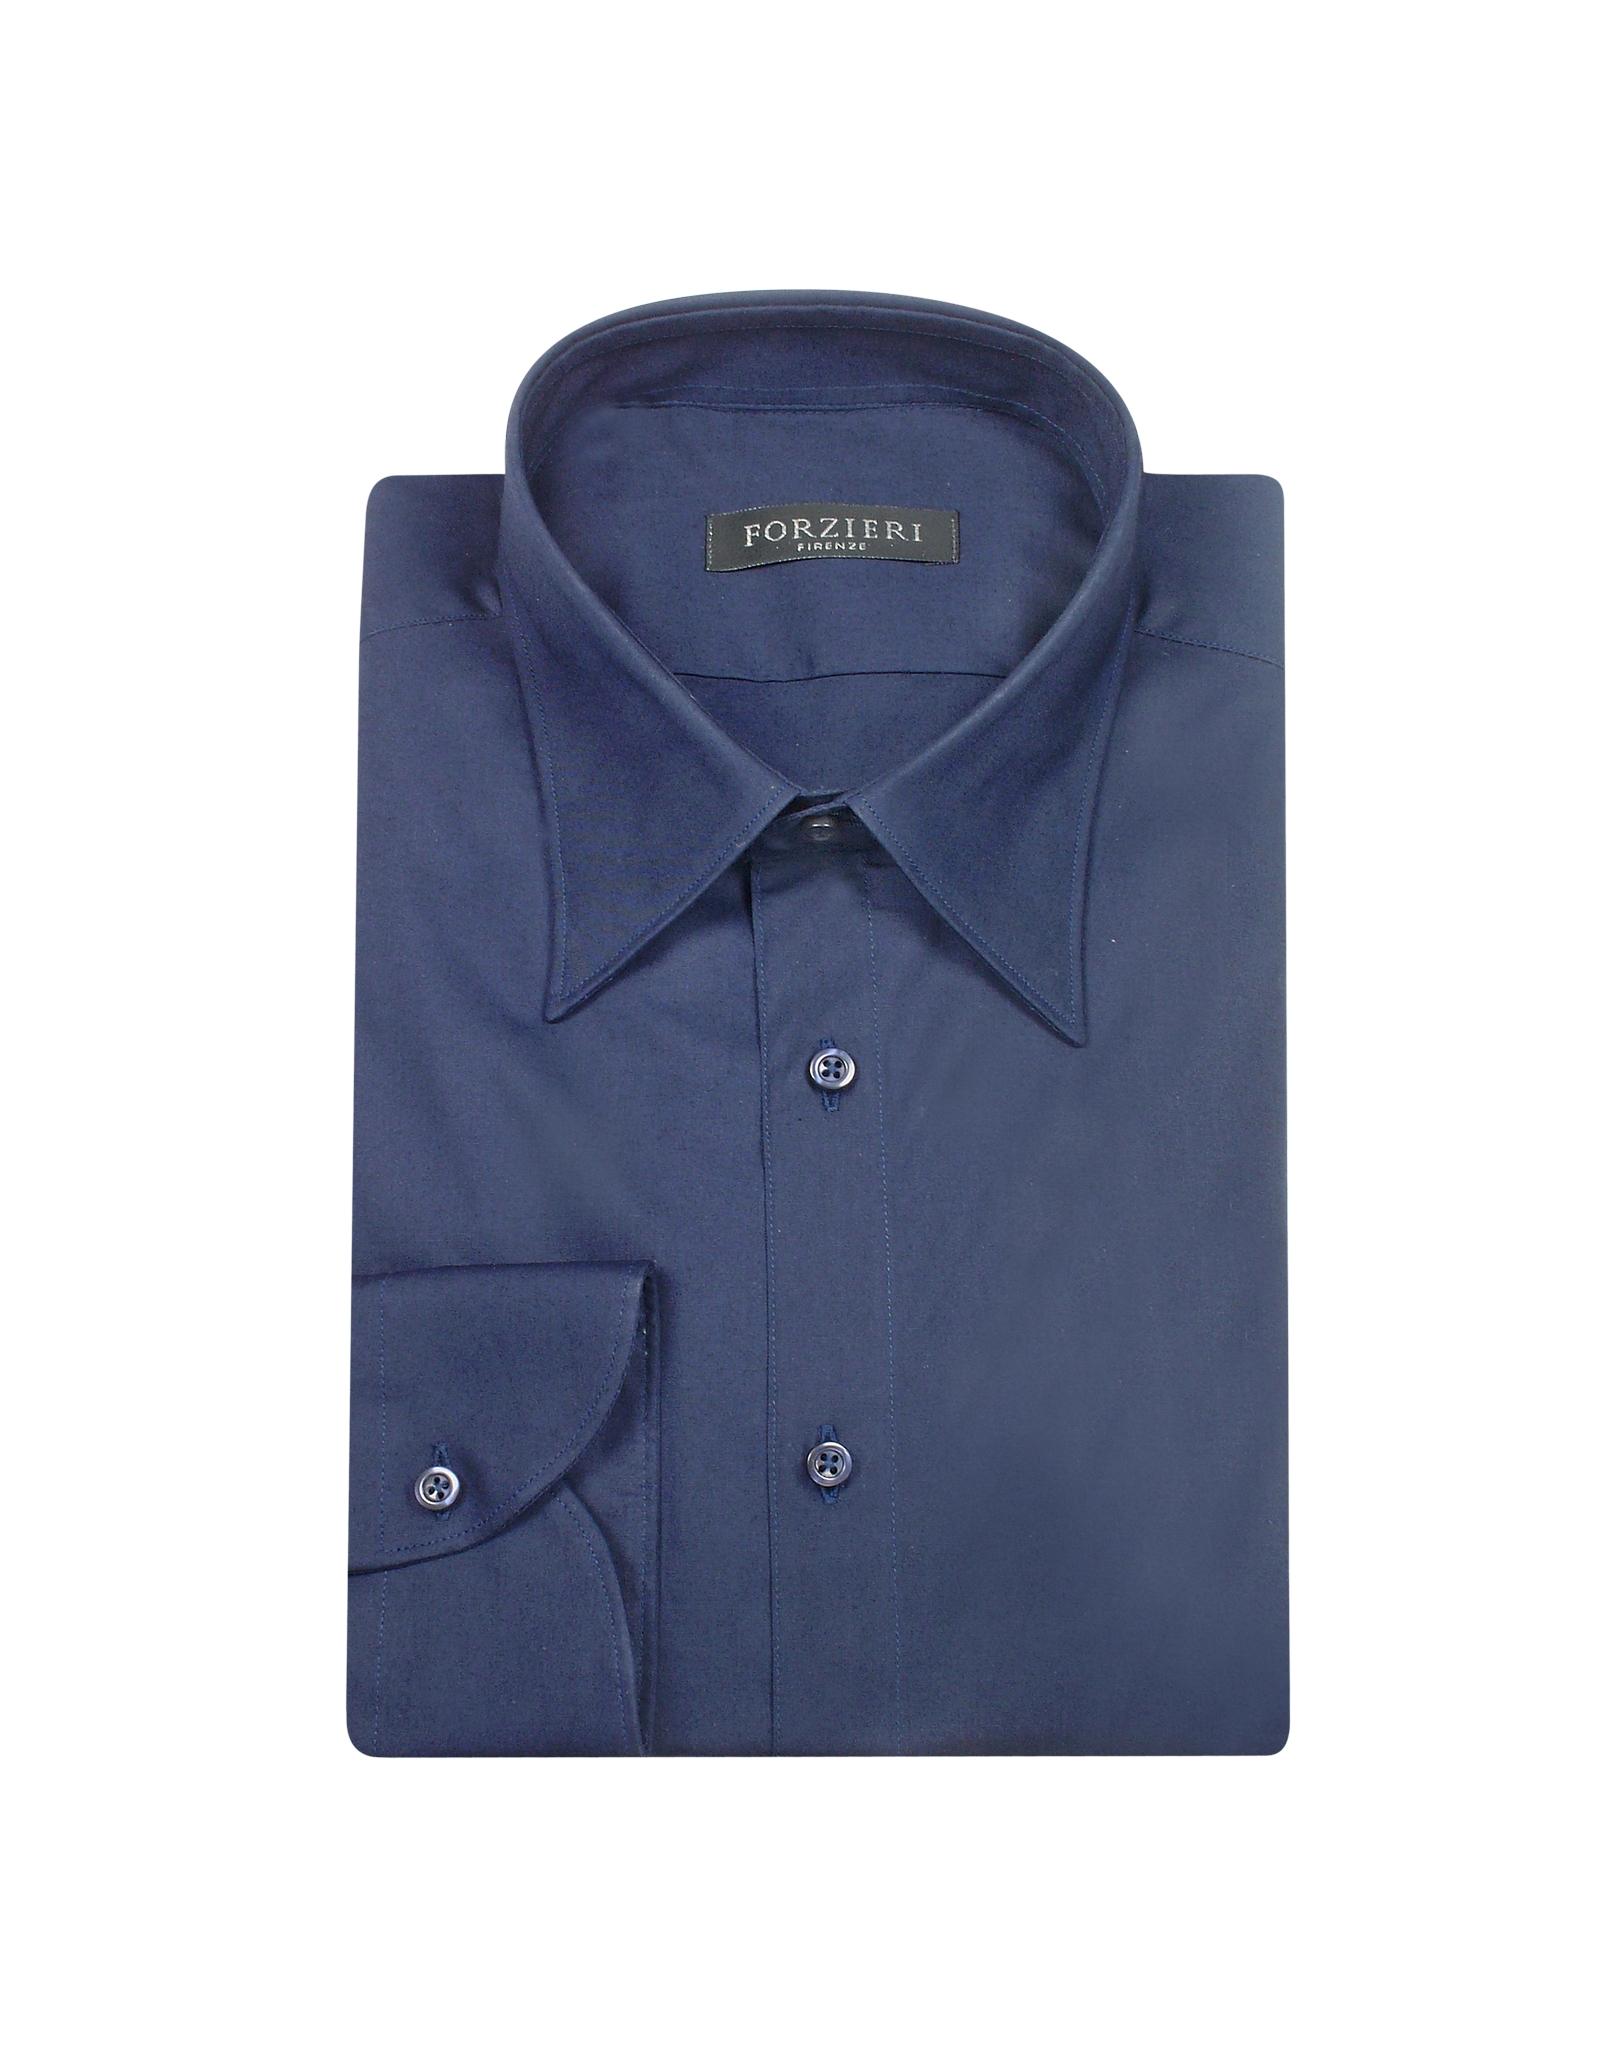 forzieri solid dark blue cotton italian slim dress shirt